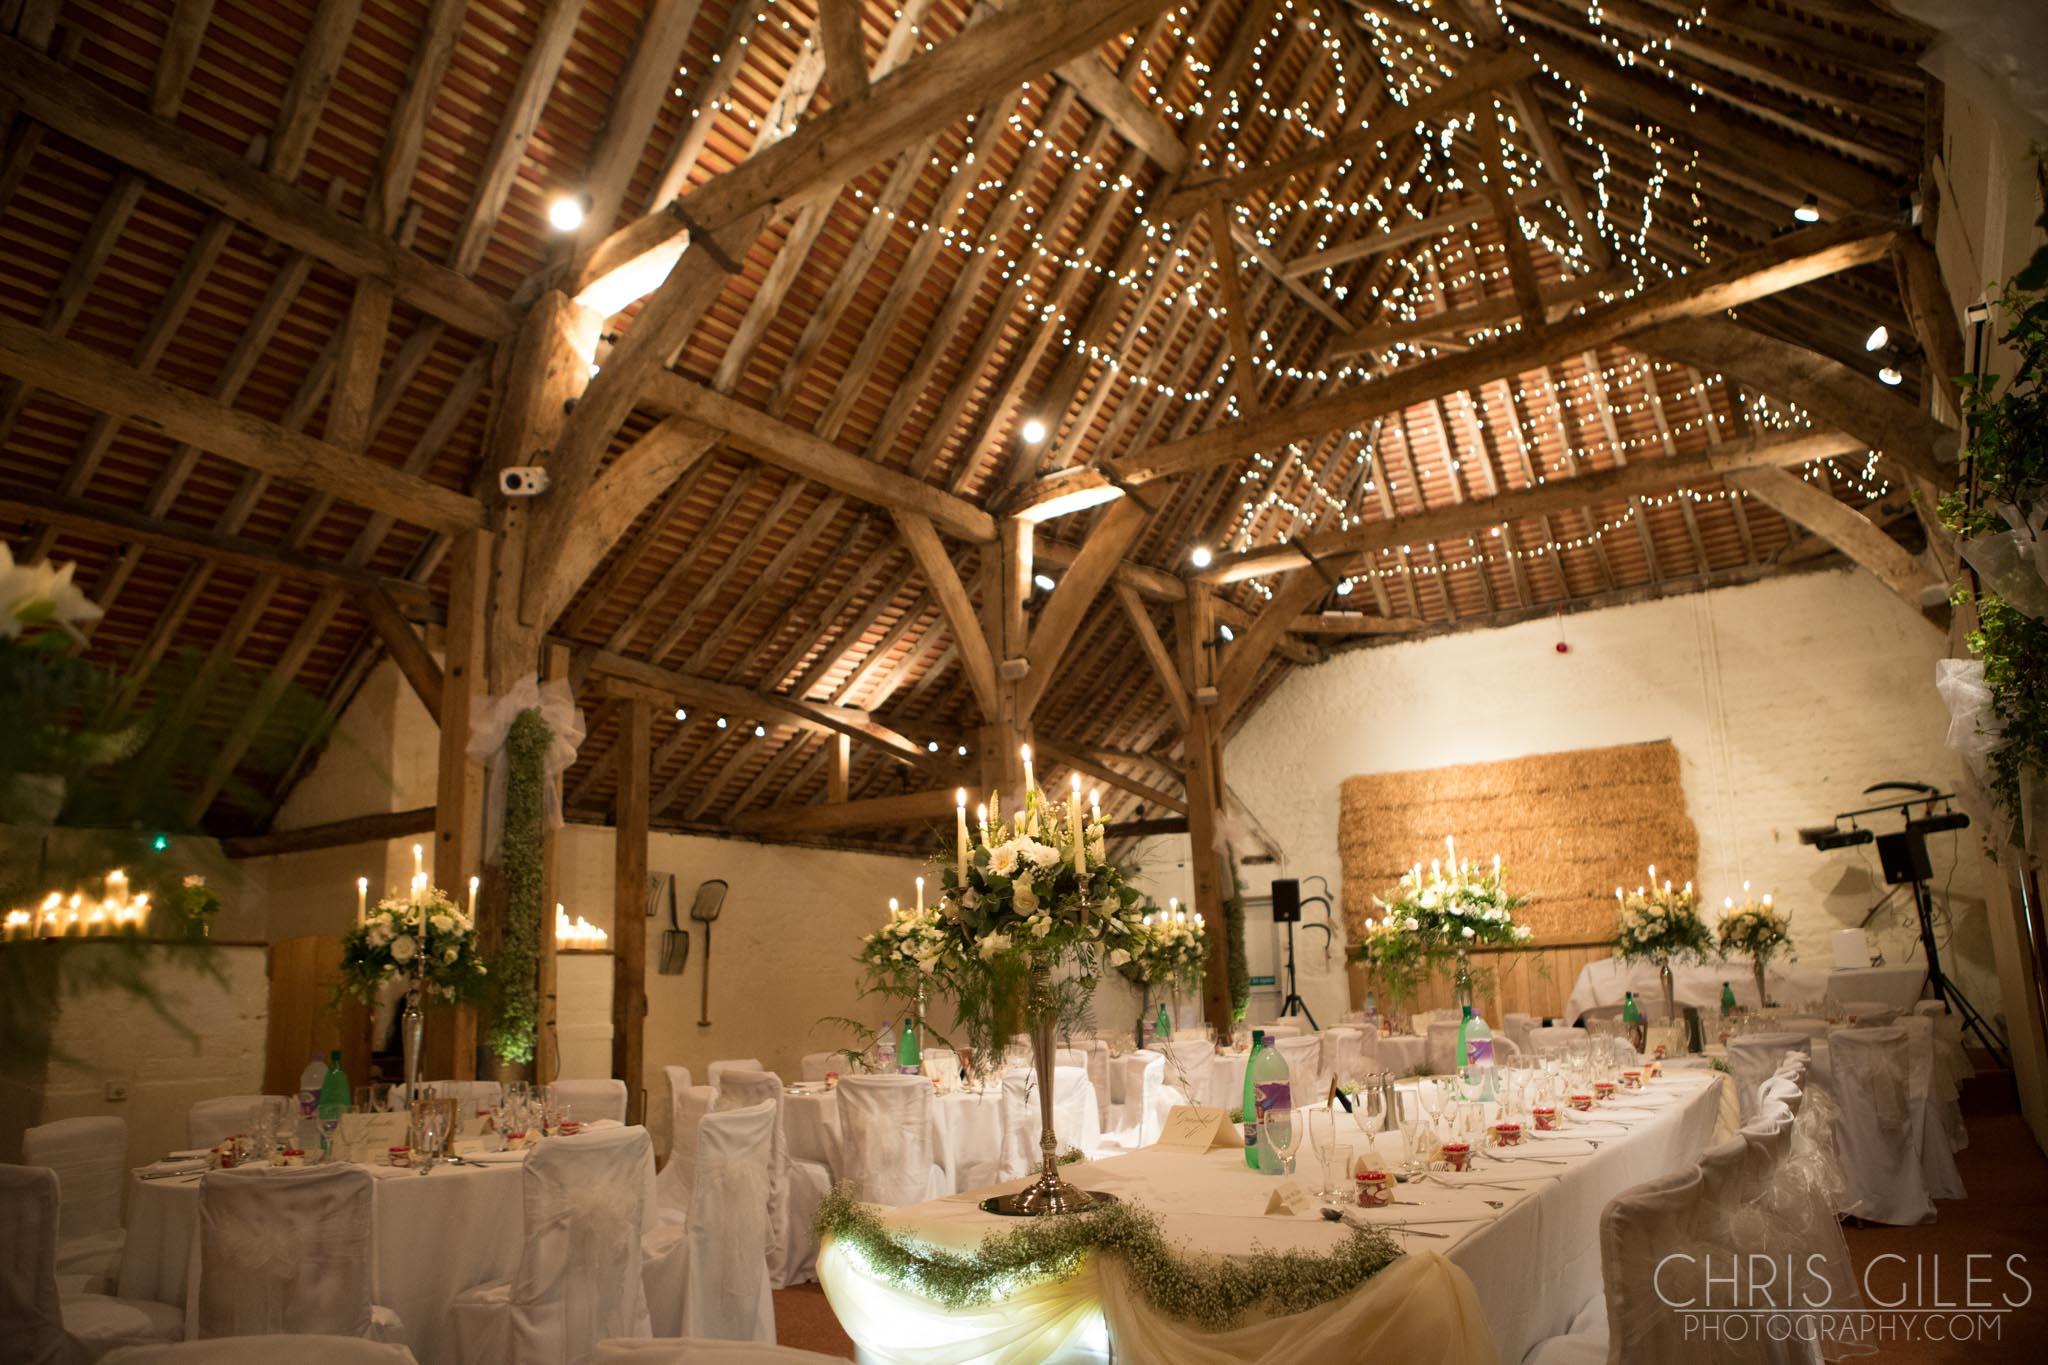 pangdean barn wedding photography chris giles photography